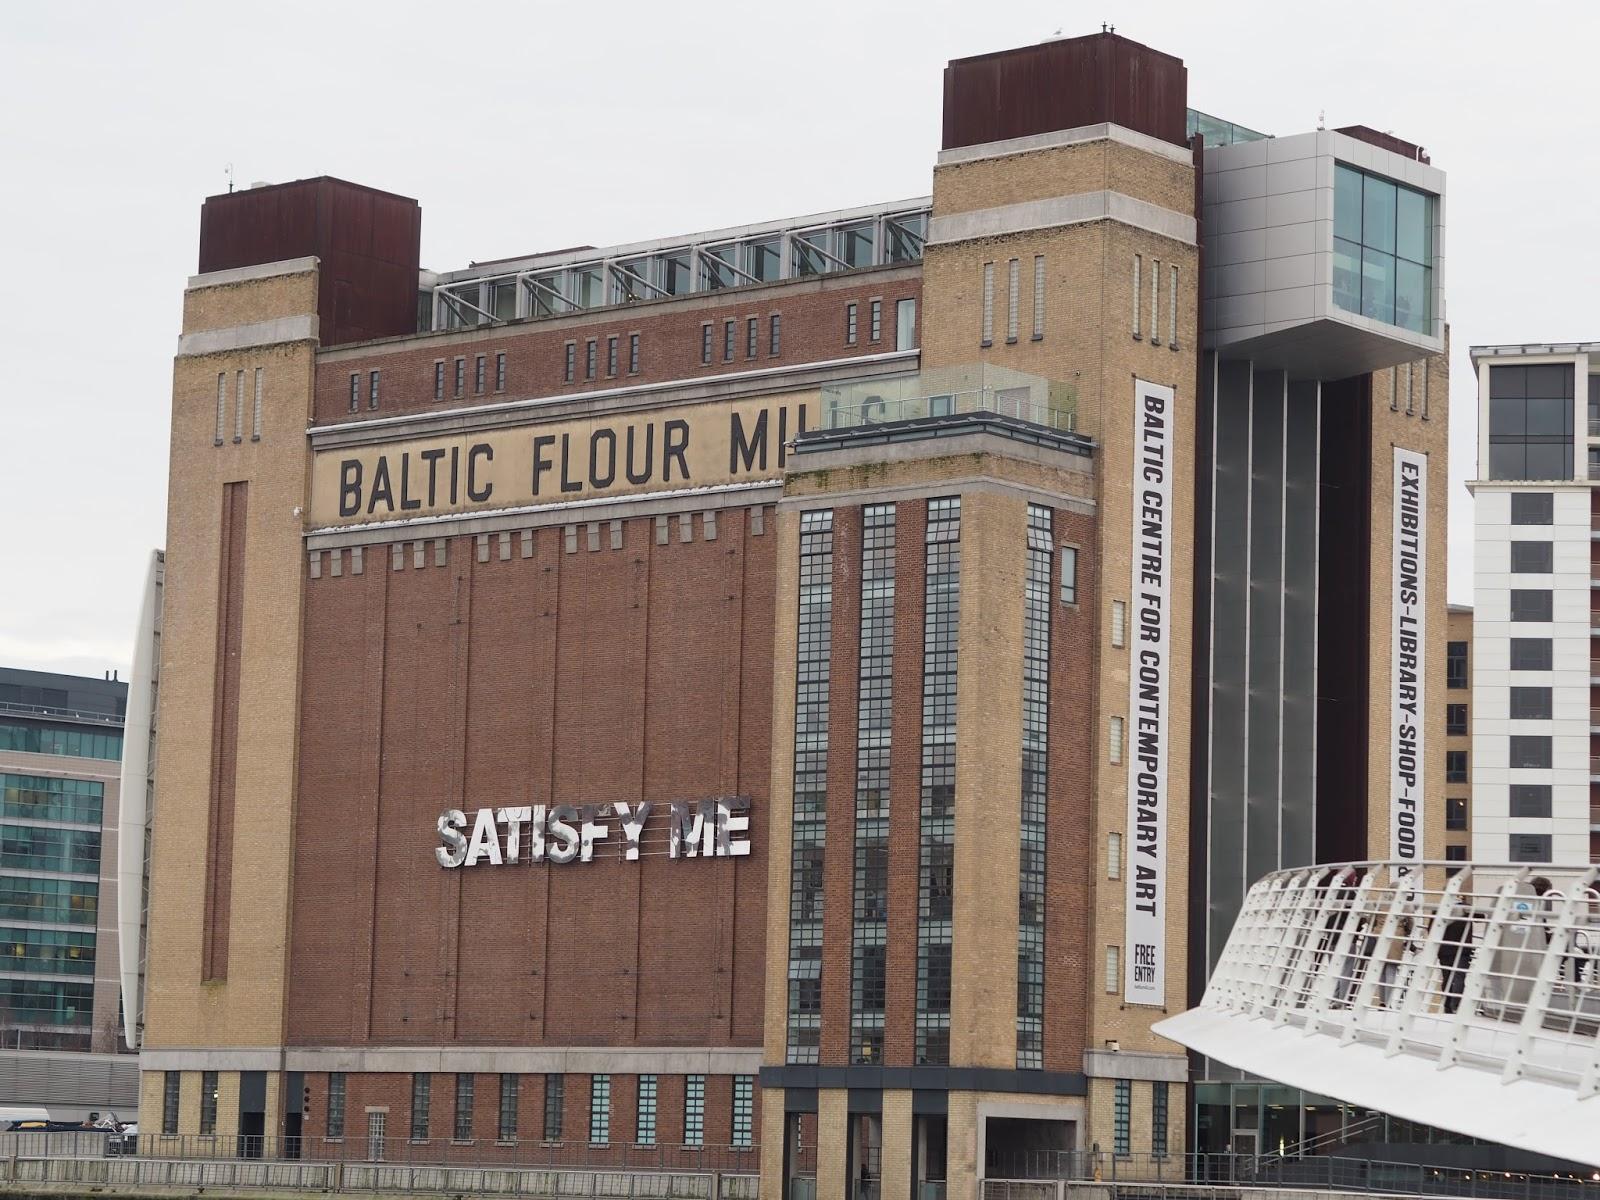 Weekend in Tynemouth, Newcastle, Baltic Flour Mill, Gateshead